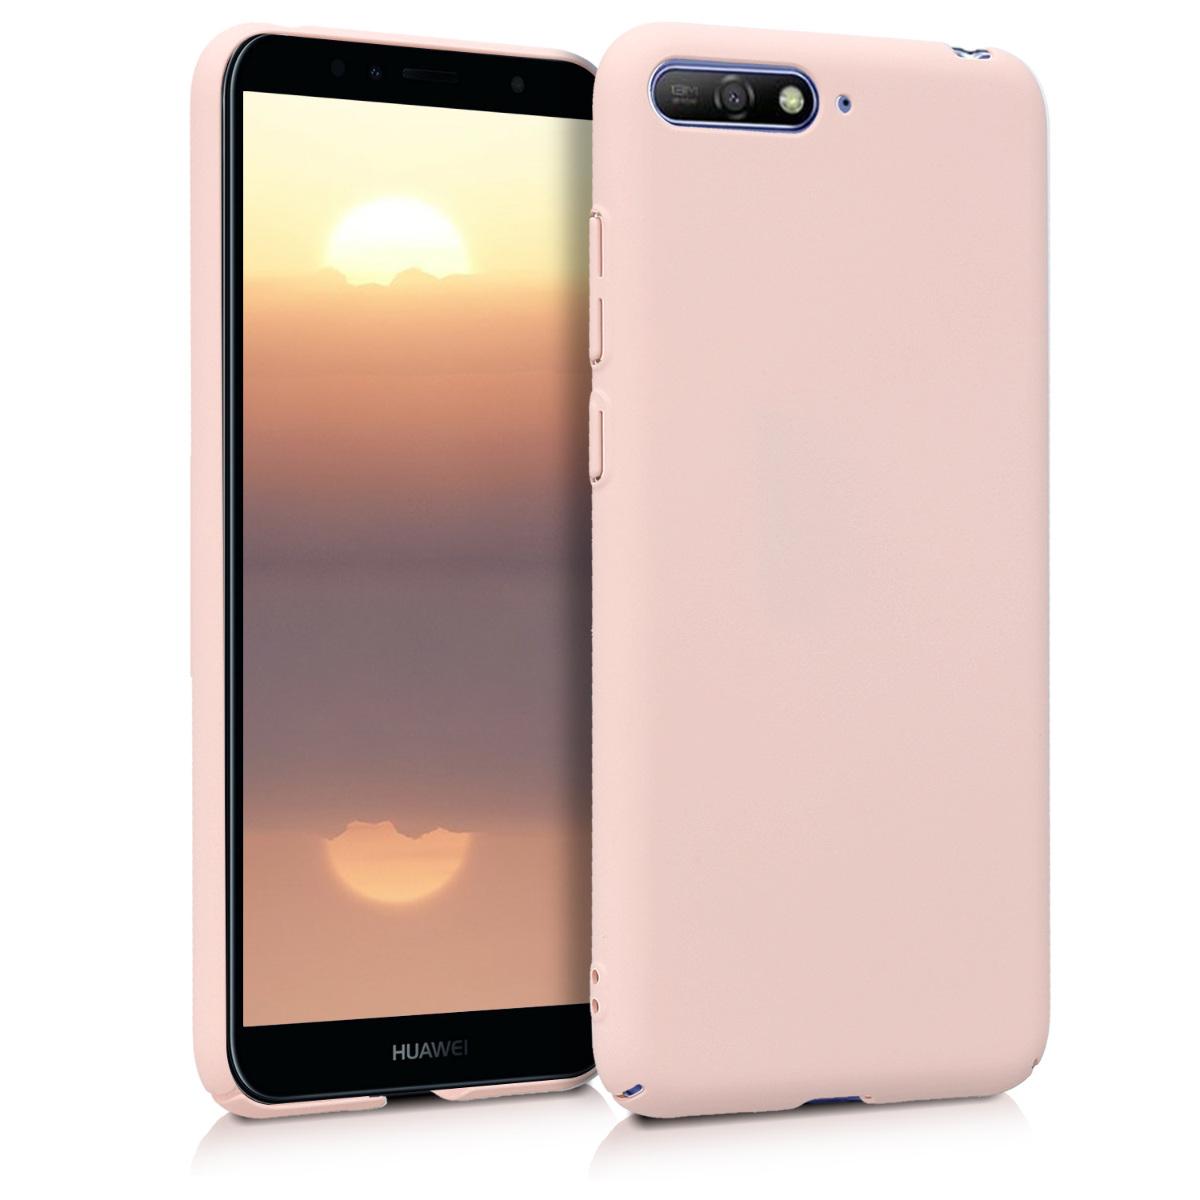 KW Σκληρή θήκη - Huawei Y6 (2018) - Rose Gold Matte (45776.89)